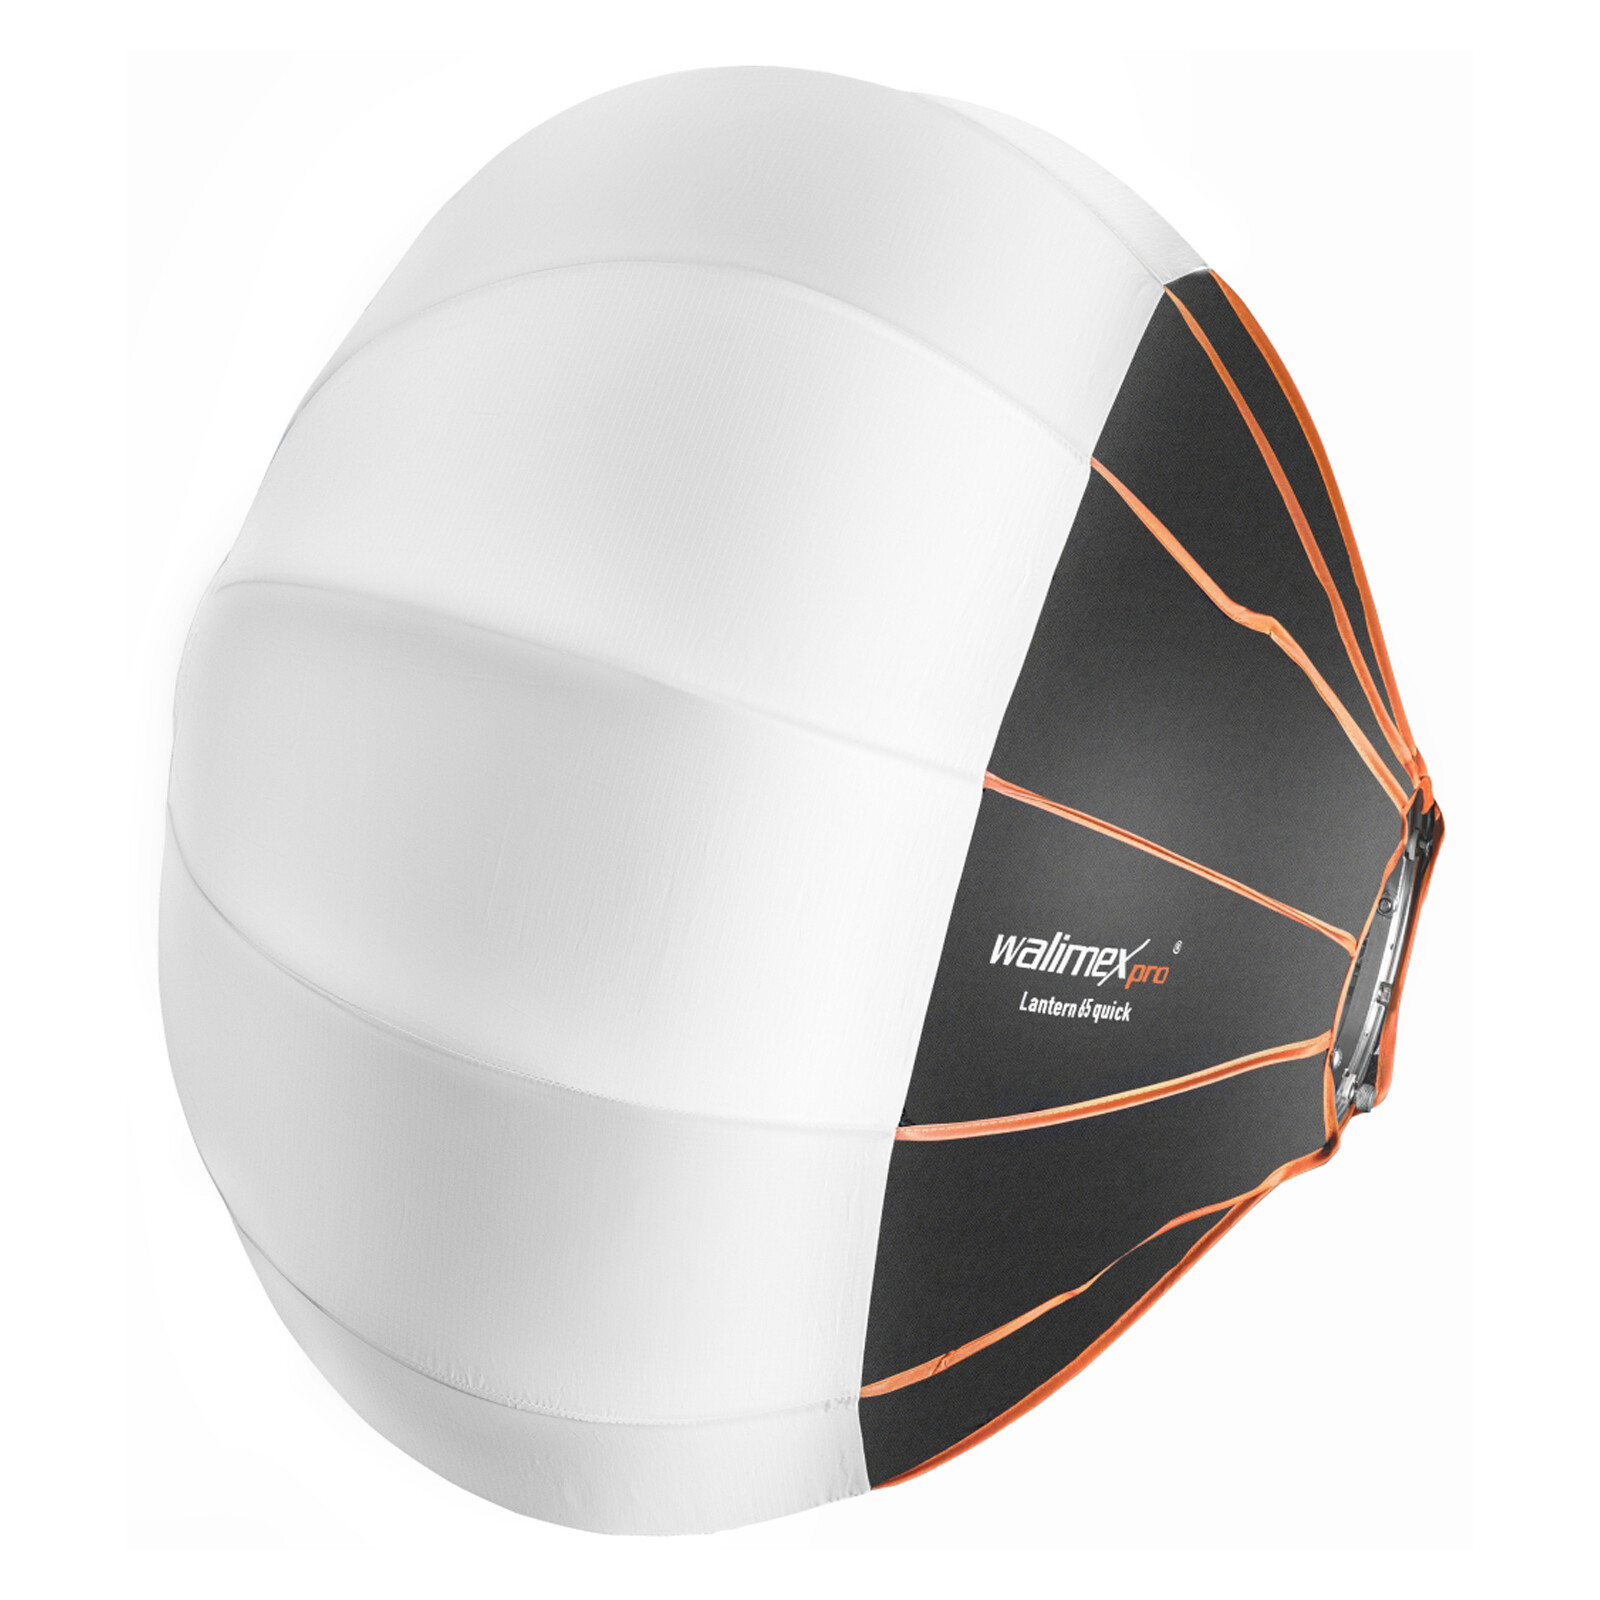 Walimex pro 360° Ambient Light Softbox 65cm mit Multiblitz P